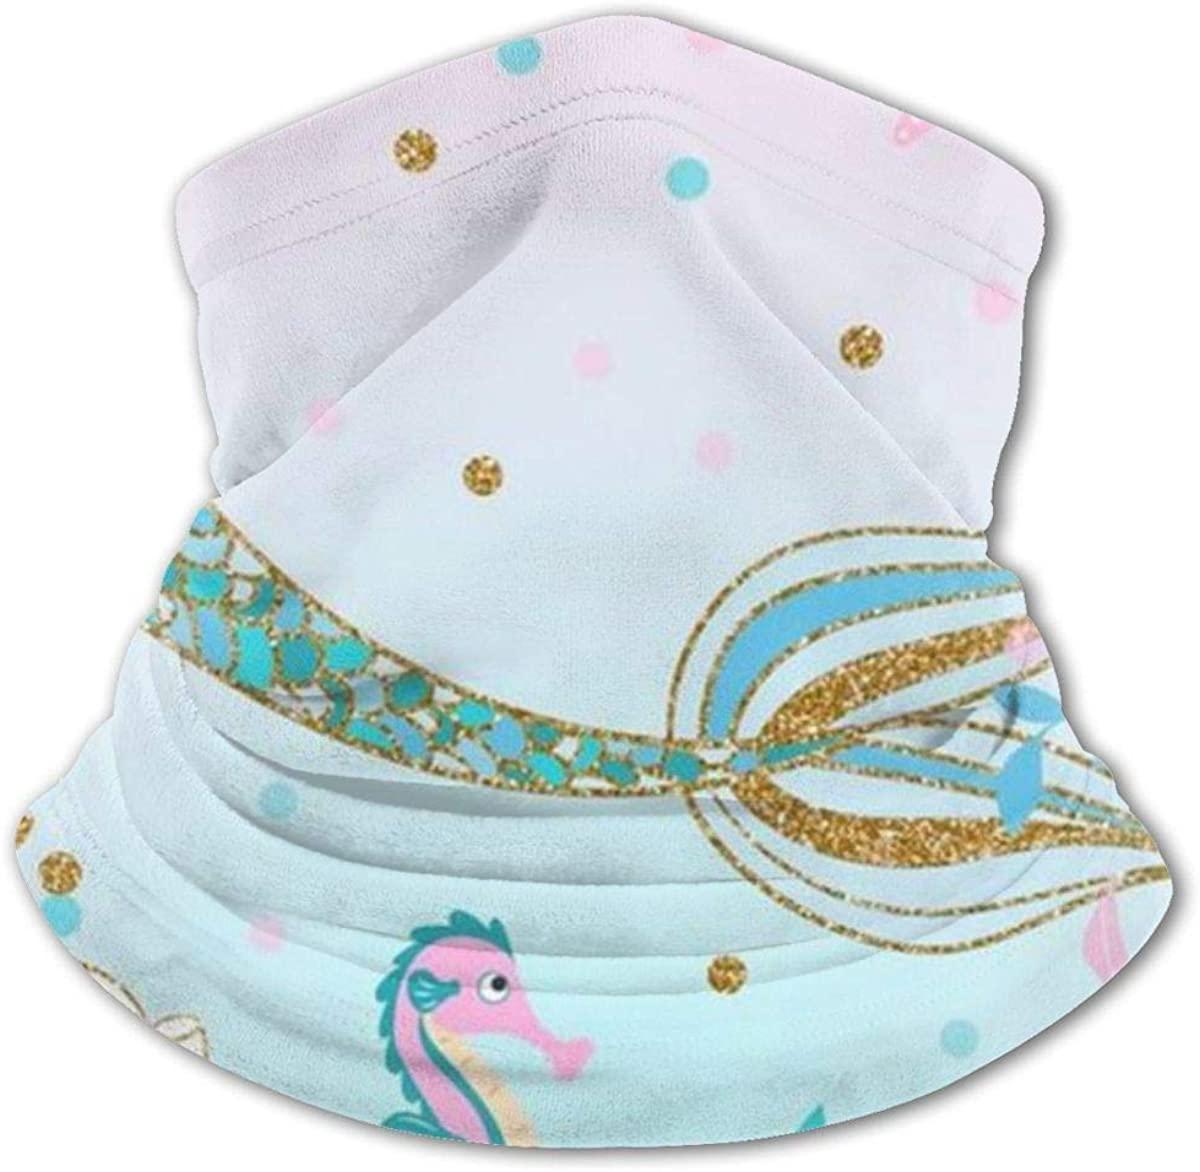 Mermaid Tail Headwear For Girls And Boys, Head Wrap, Neck Gaiter, Headband, Tenn Fishing Mask, Magic Scarf, Tube Mask, Face Bandana Mask For Camping Running Cycling